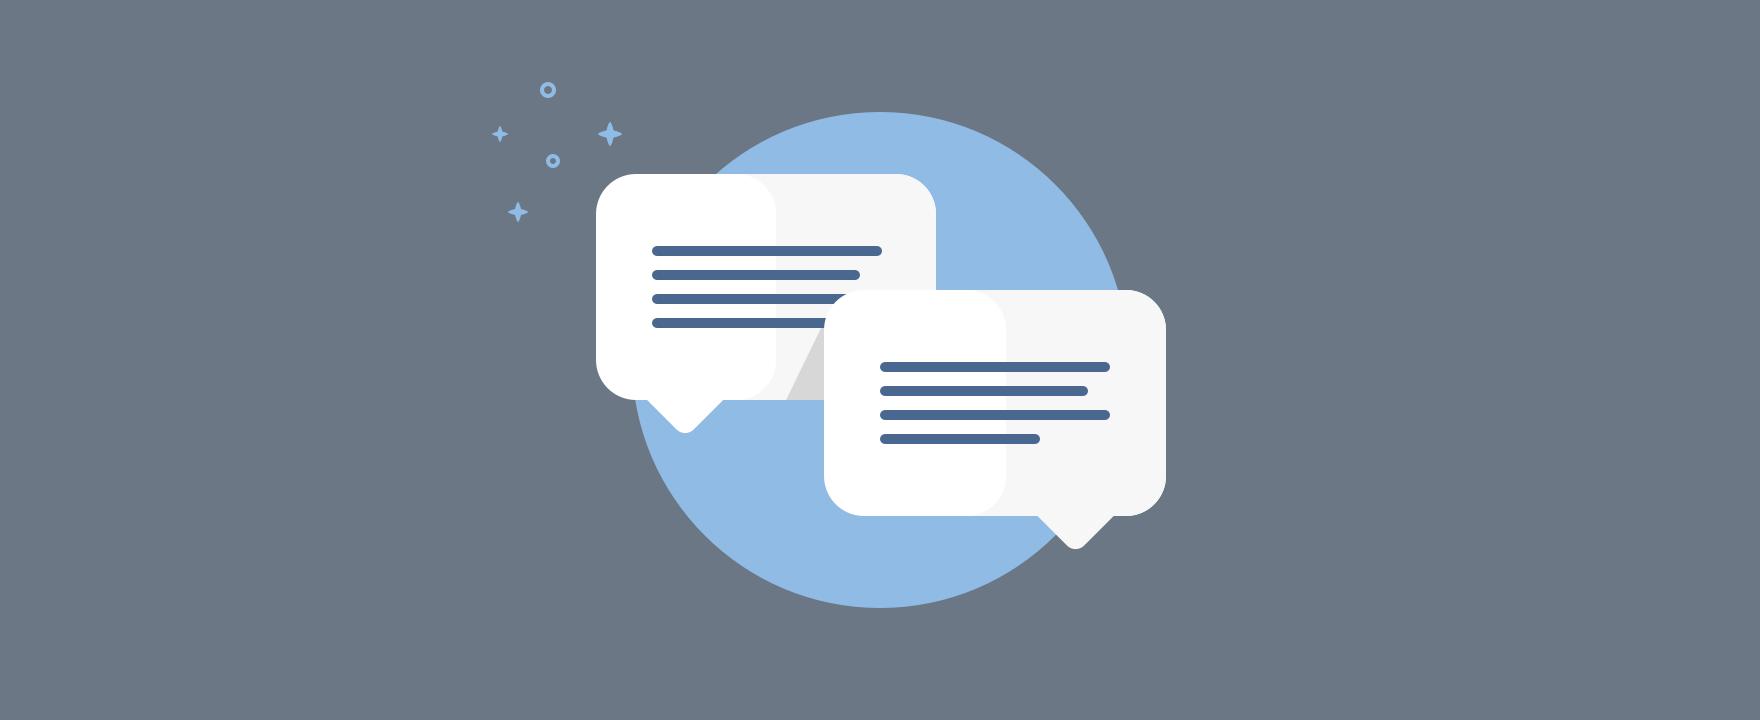 Die 4 nützlichsten Conversational Commerce Tools